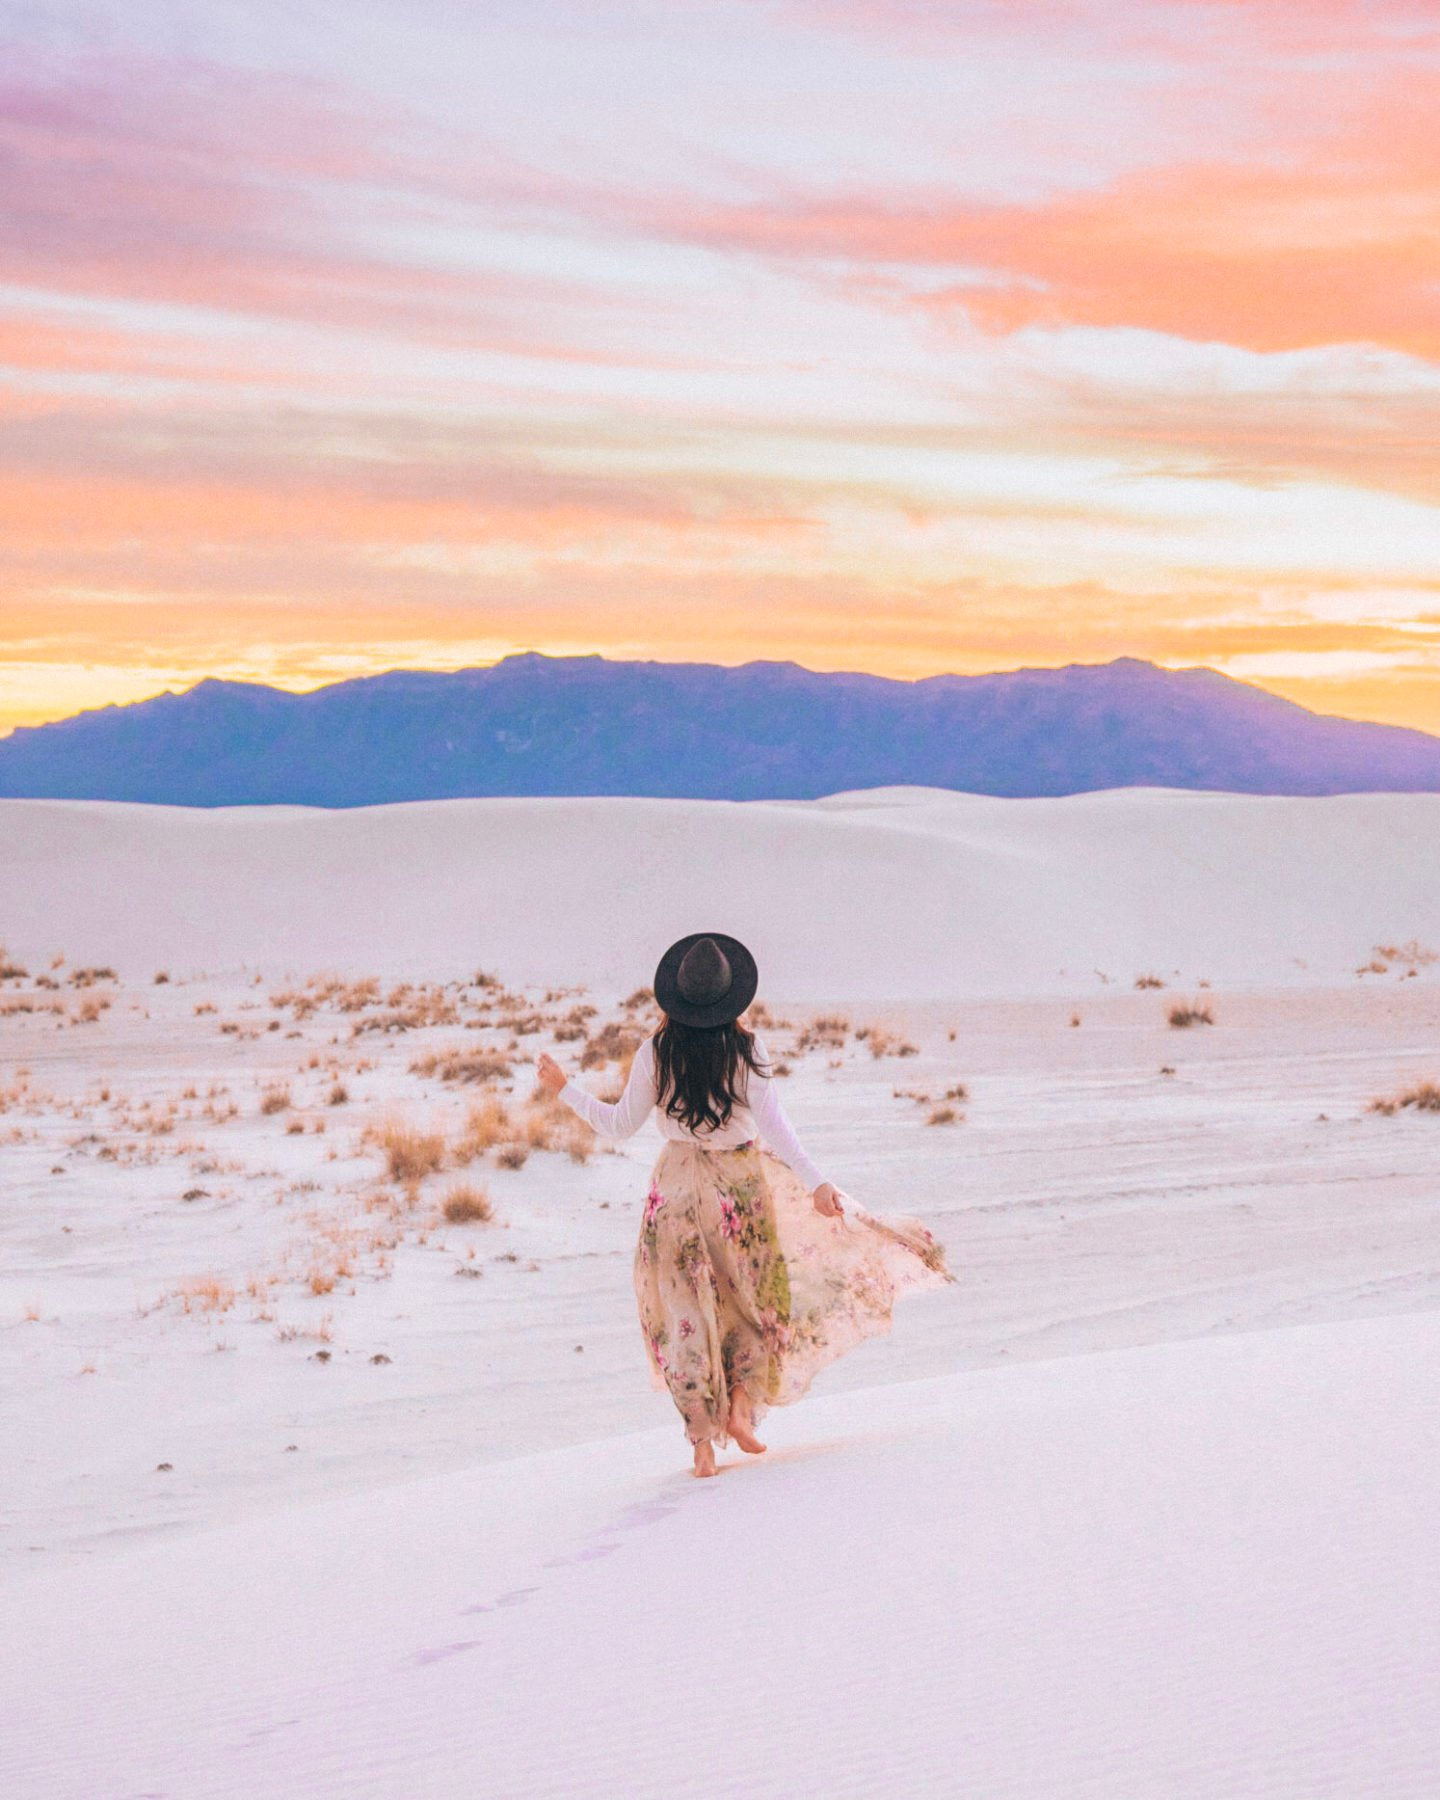 girl wearing skirt at white sands national monument at sunset